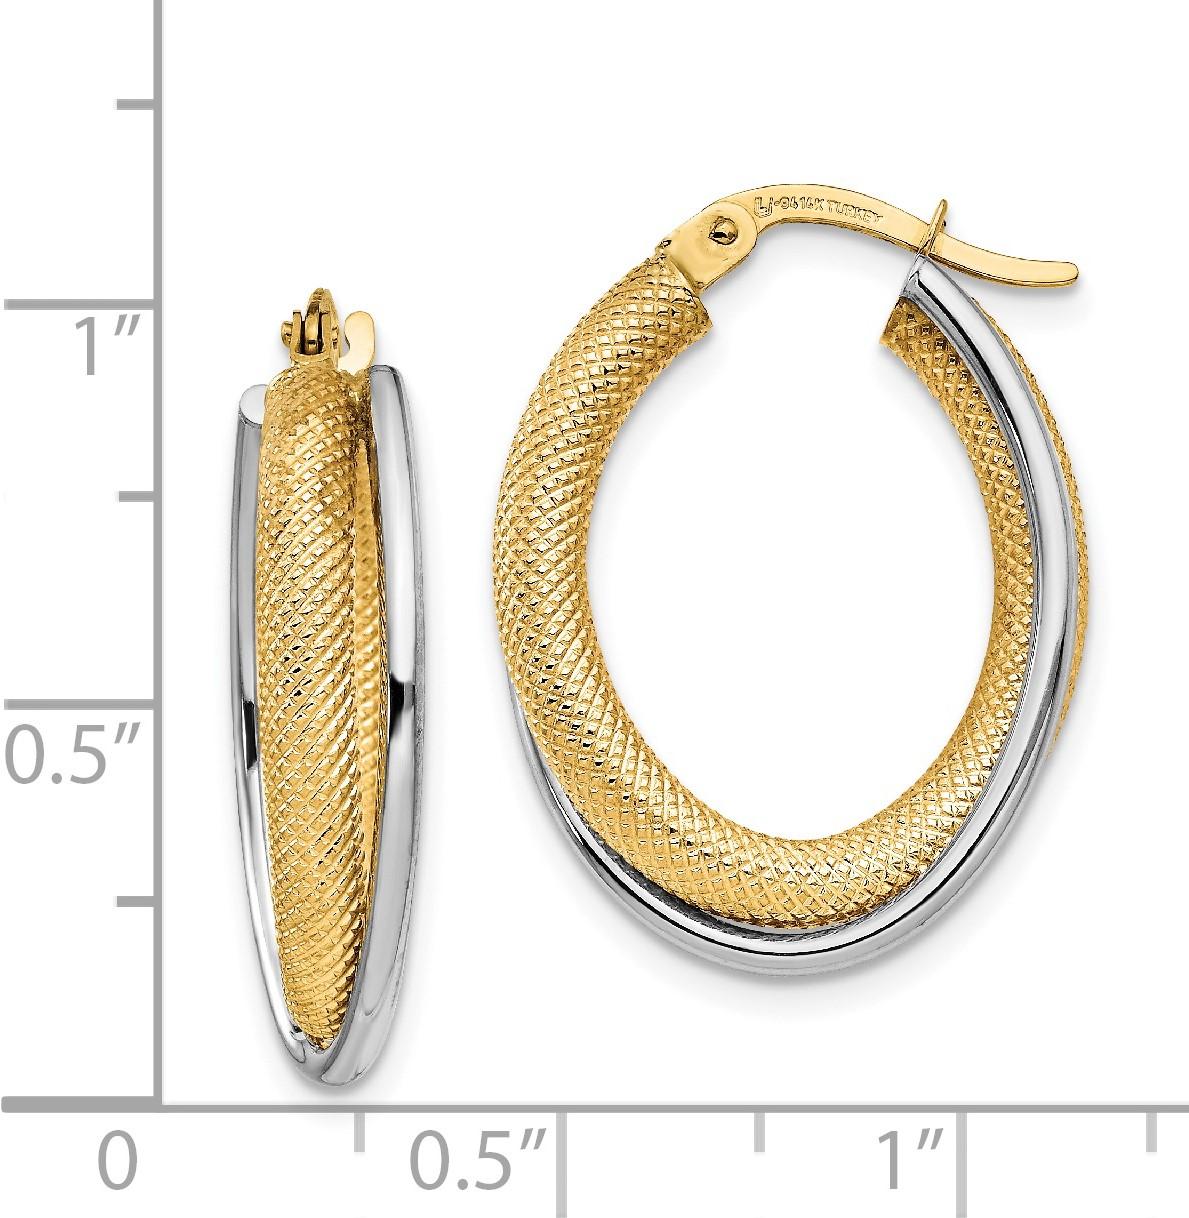 Leslie's 14K Two-tone Polished & Textured Hoop Earrings - image 2 de 3